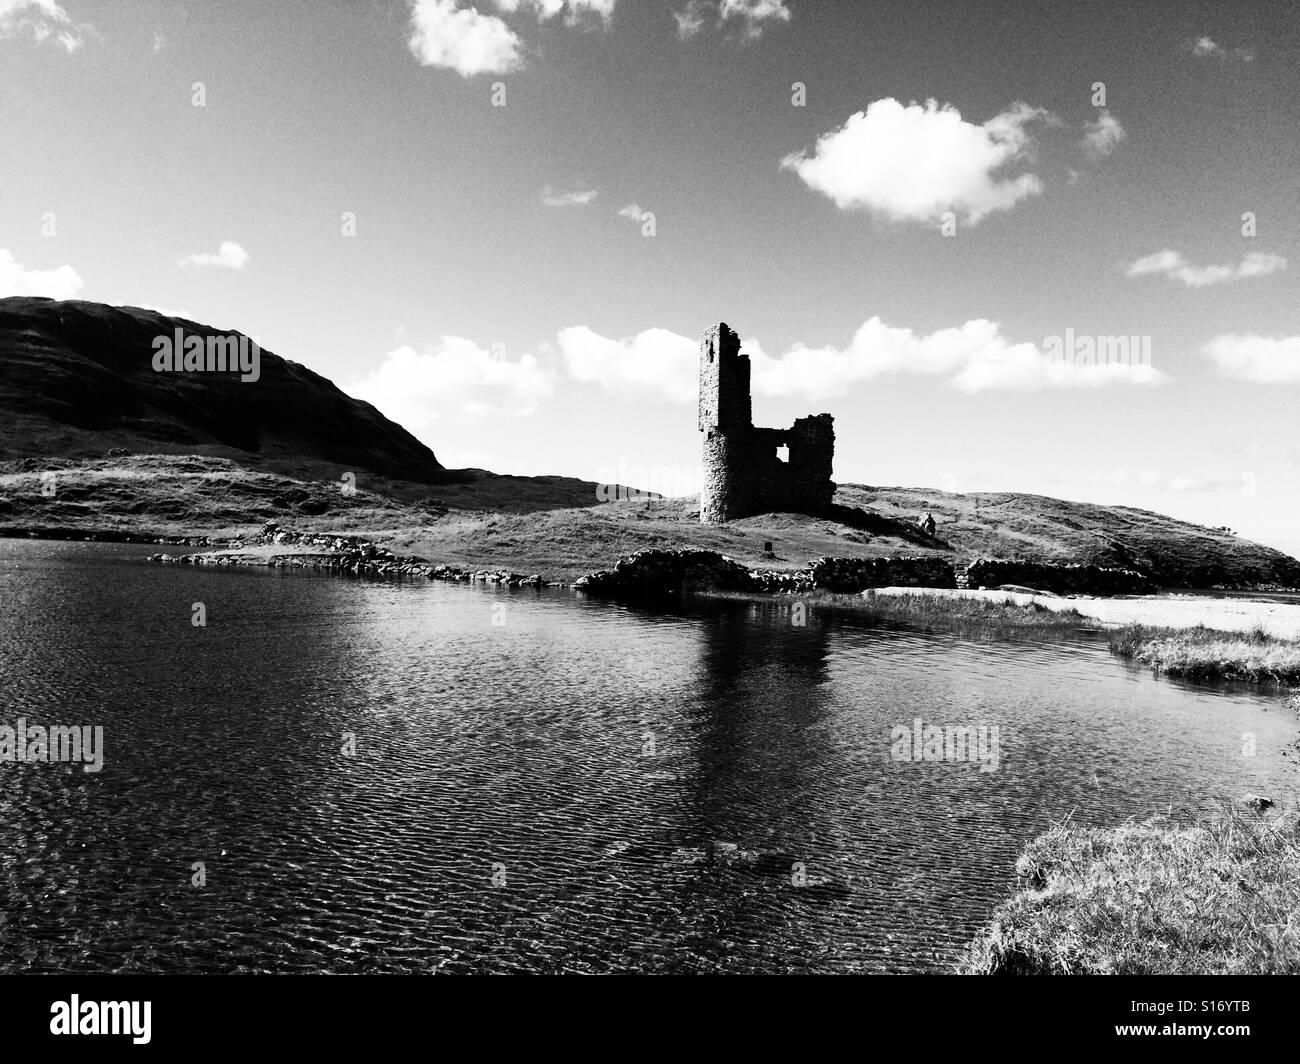 Ruined castle in Scotland - Stock Image